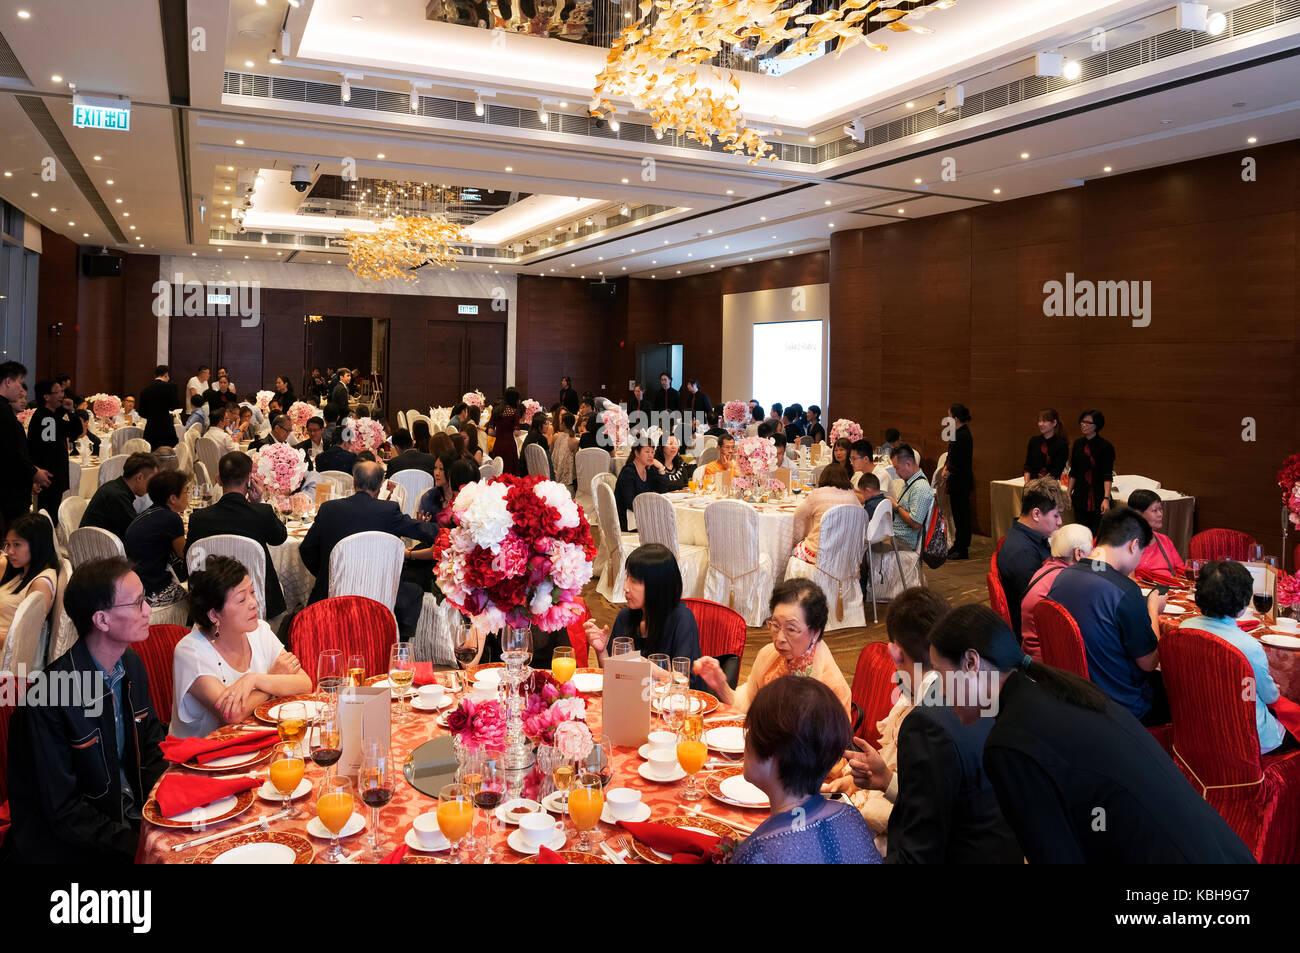 chinese wedding decoration photos chinese wedding decoration images alamy. Black Bedroom Furniture Sets. Home Design Ideas